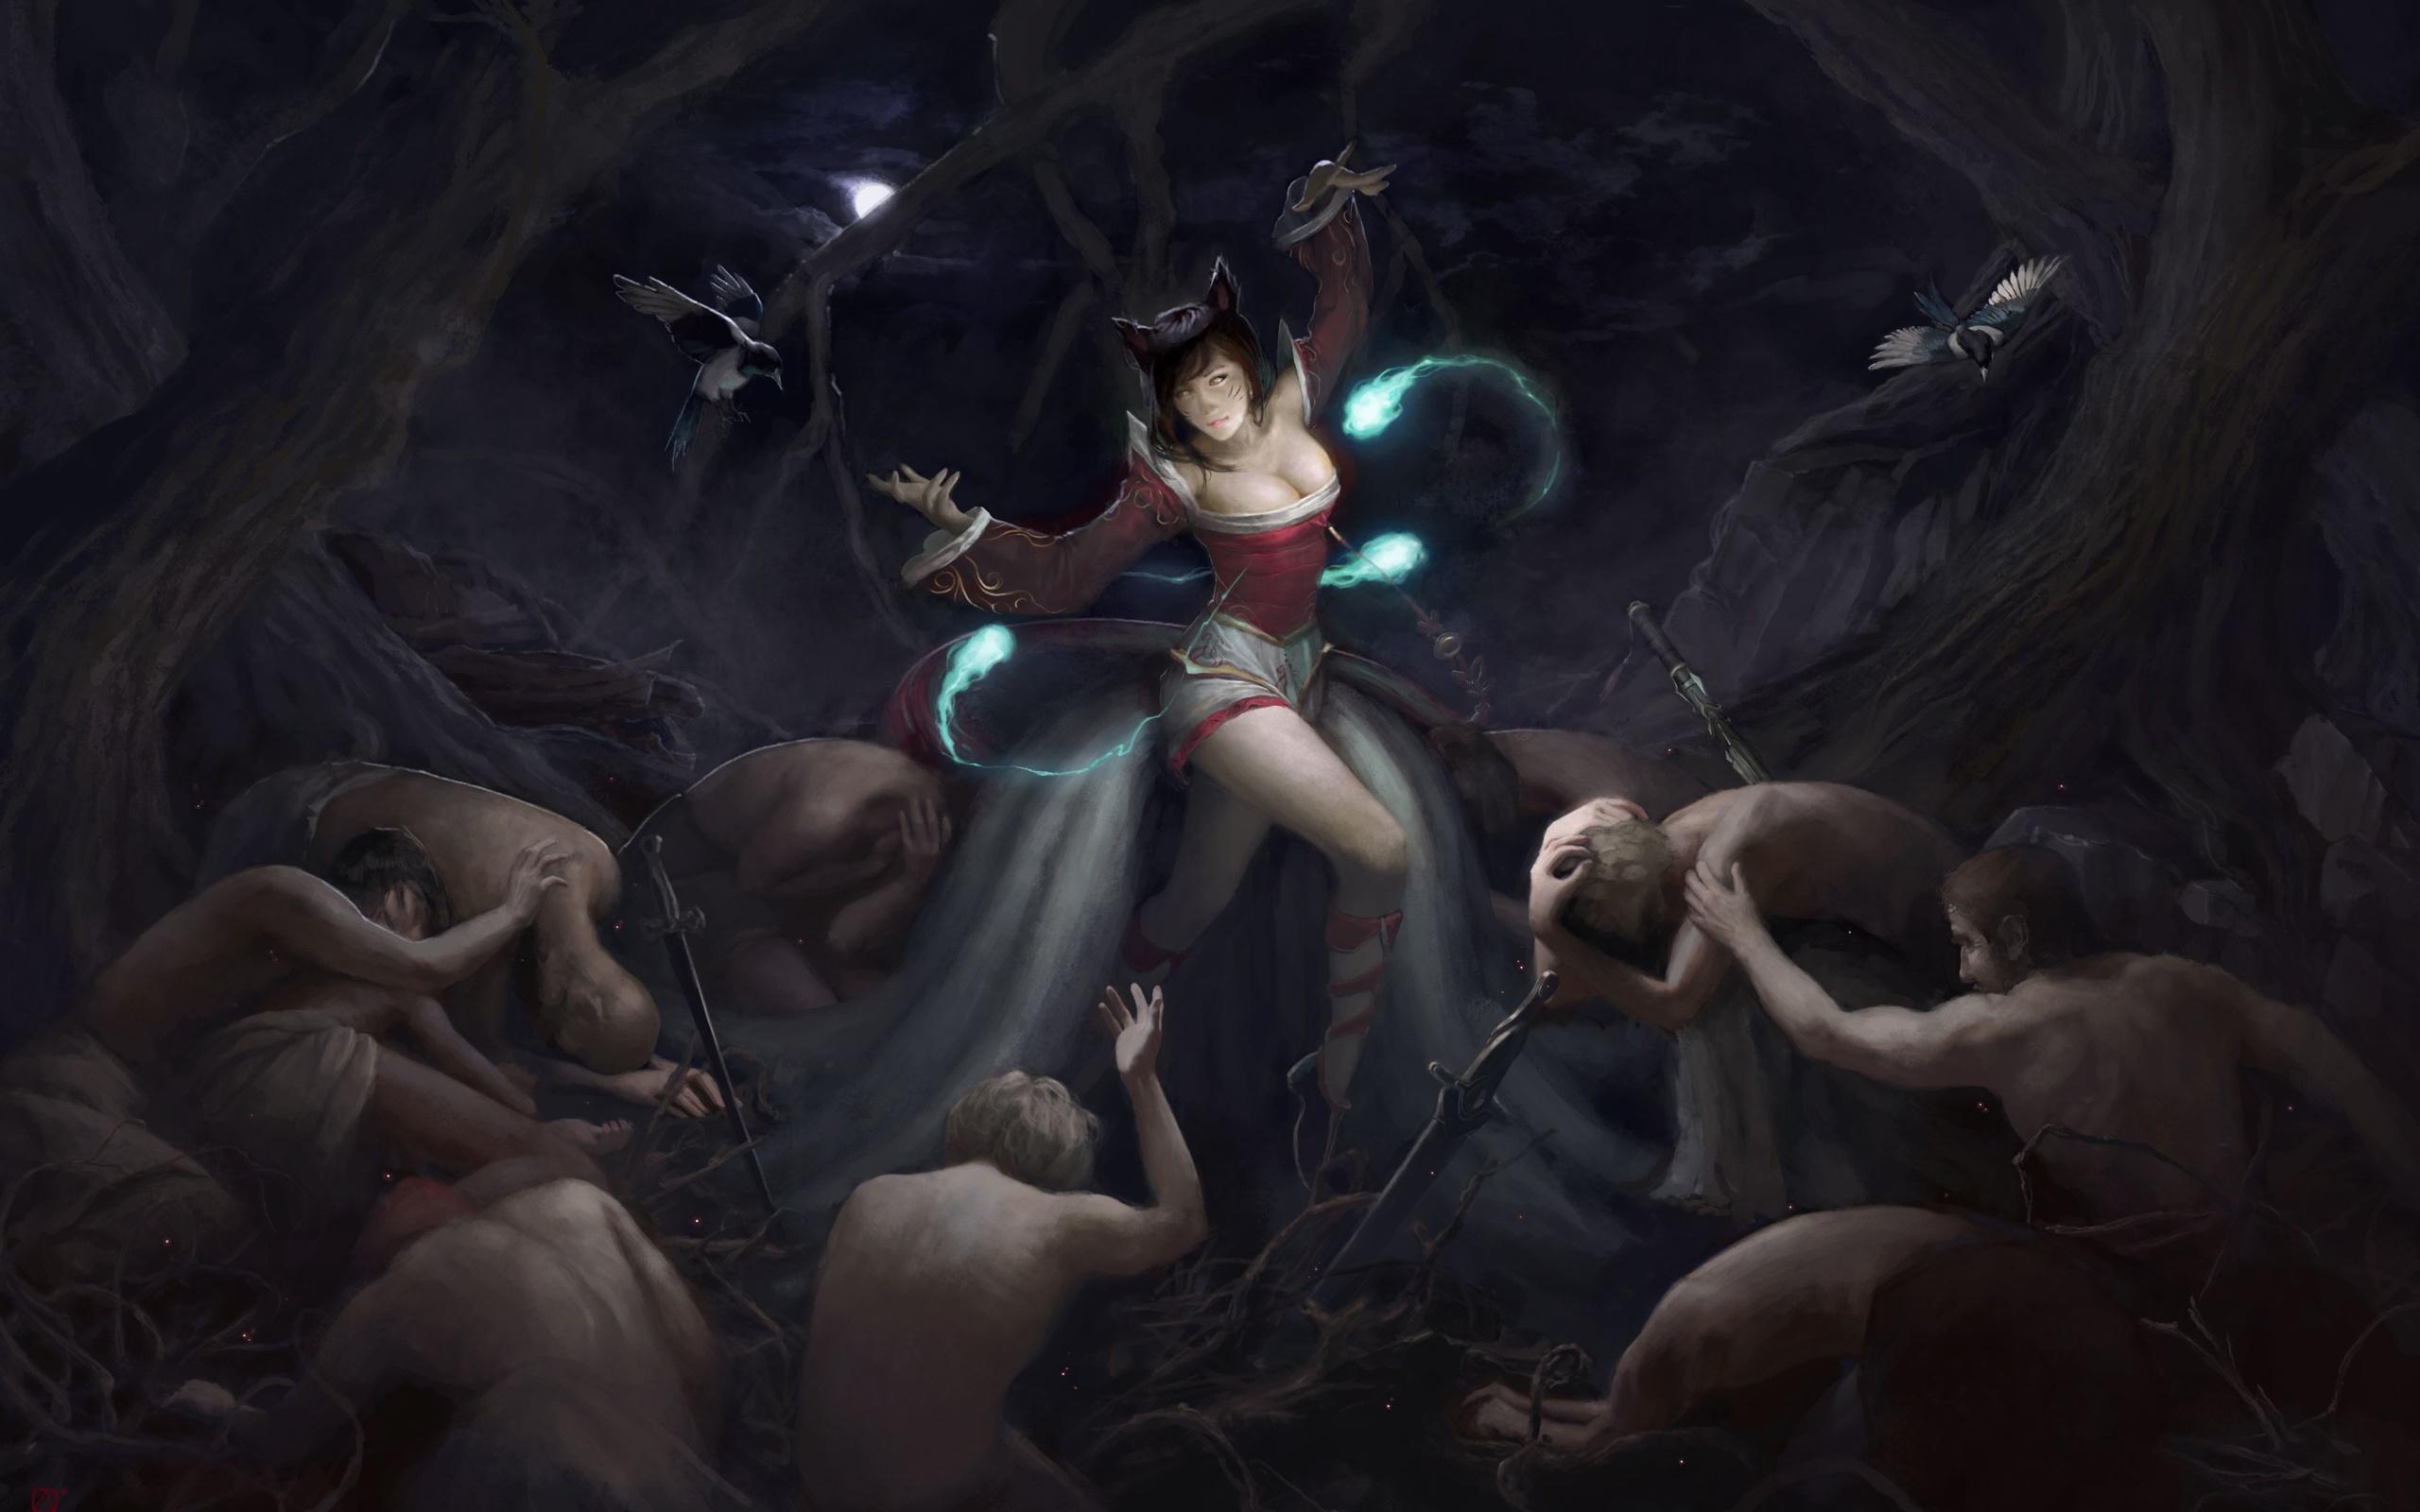 аниме, лига легенд, воин, демон, ари